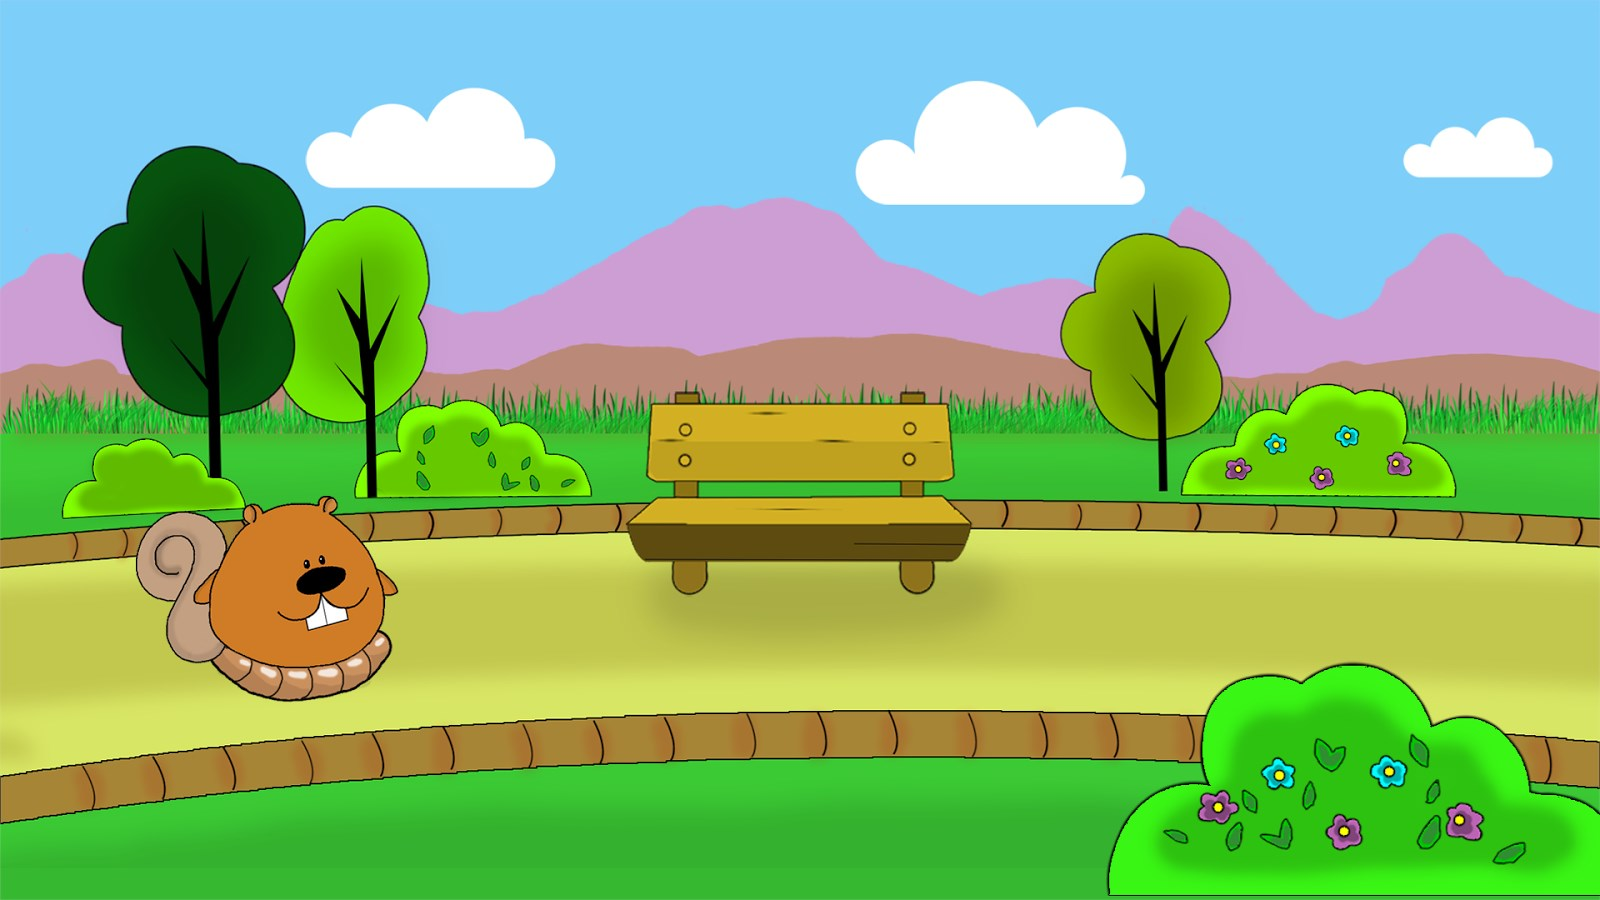 Shoot the Squirrel - Paintball - Imagem 1 do software